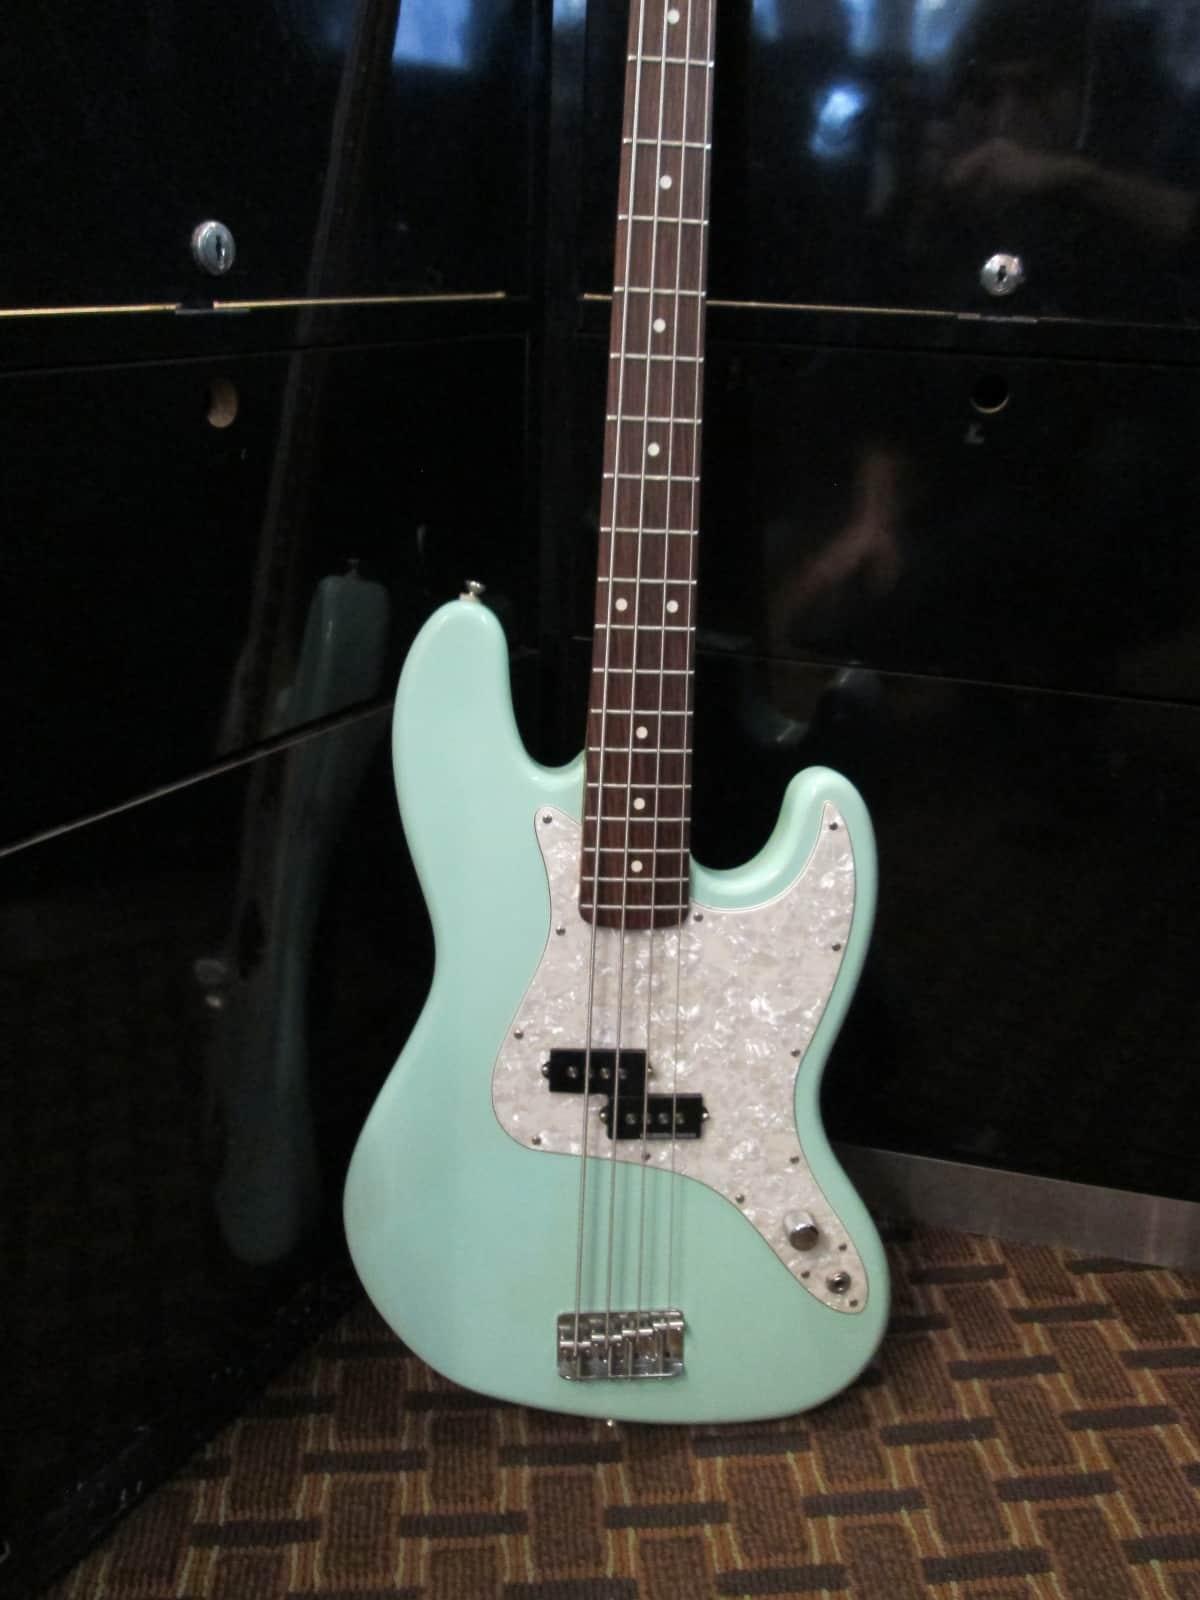 Fender Mark Hoppus Signature Precision Bass Surf Green